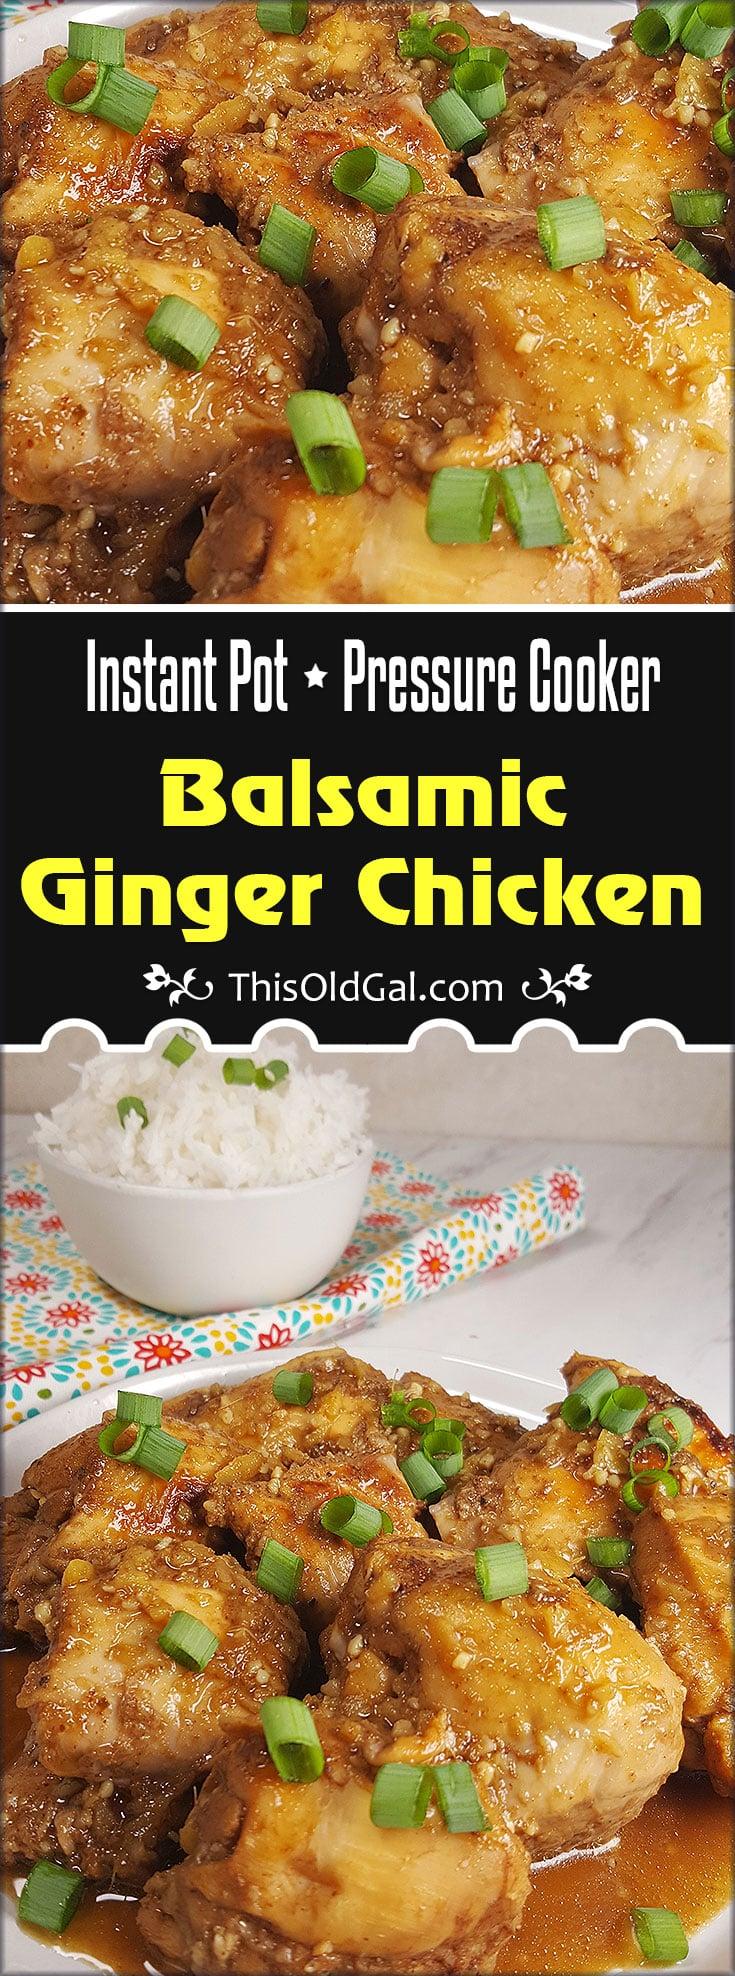 Instant Pot Pressure Cooker Balsamic Ginger Chicken